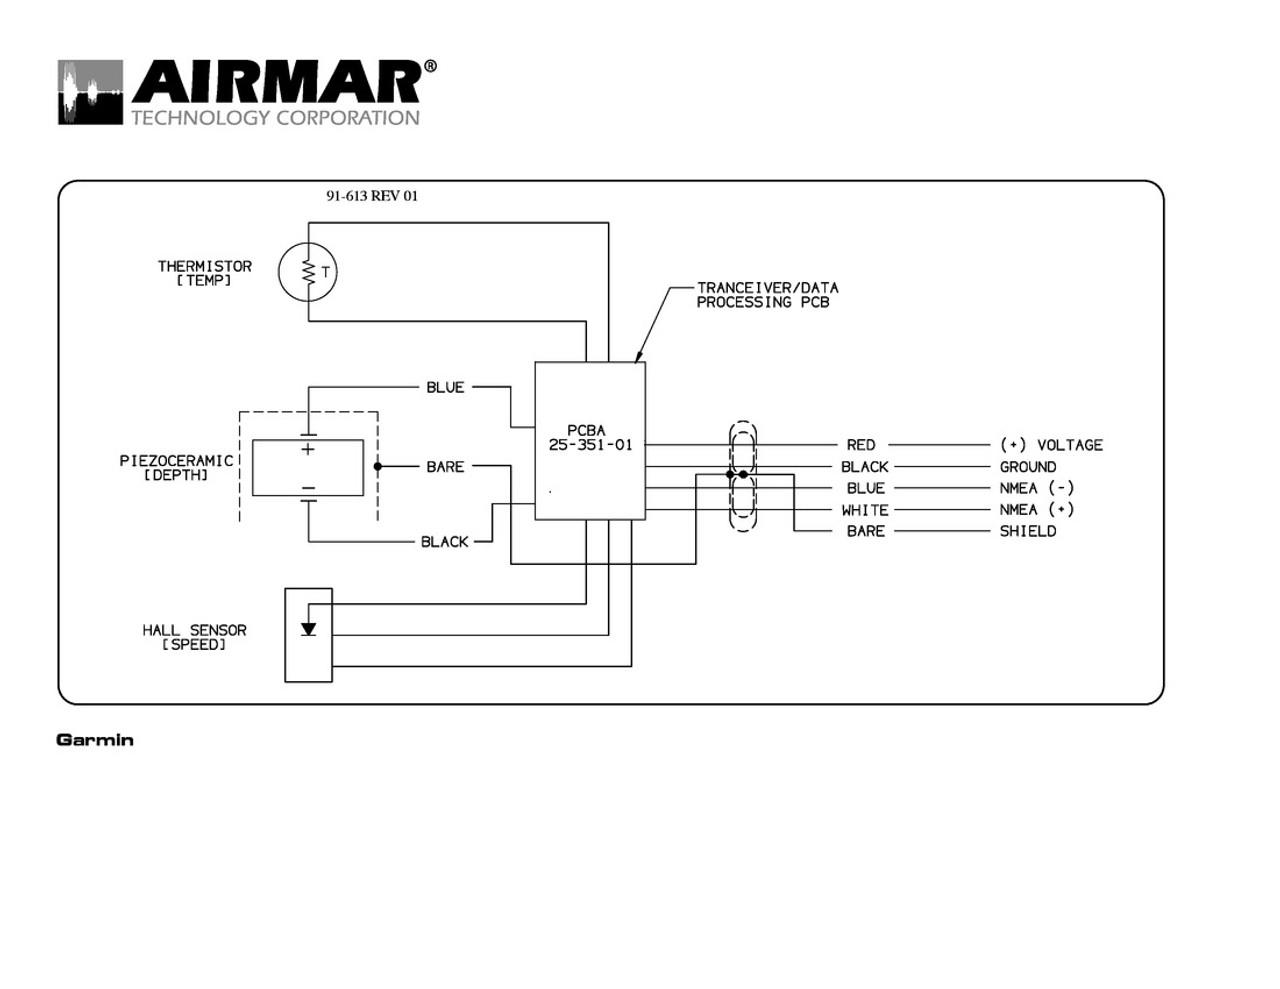 Airmar Wiring Diagram NMEA 0183 bare | Blue Bottle Marine on raymarine seatalk wiring, synchro wiring, transducer wiring, nasa wiring, abyc wiring, usb wiring, smartcraft wiring,